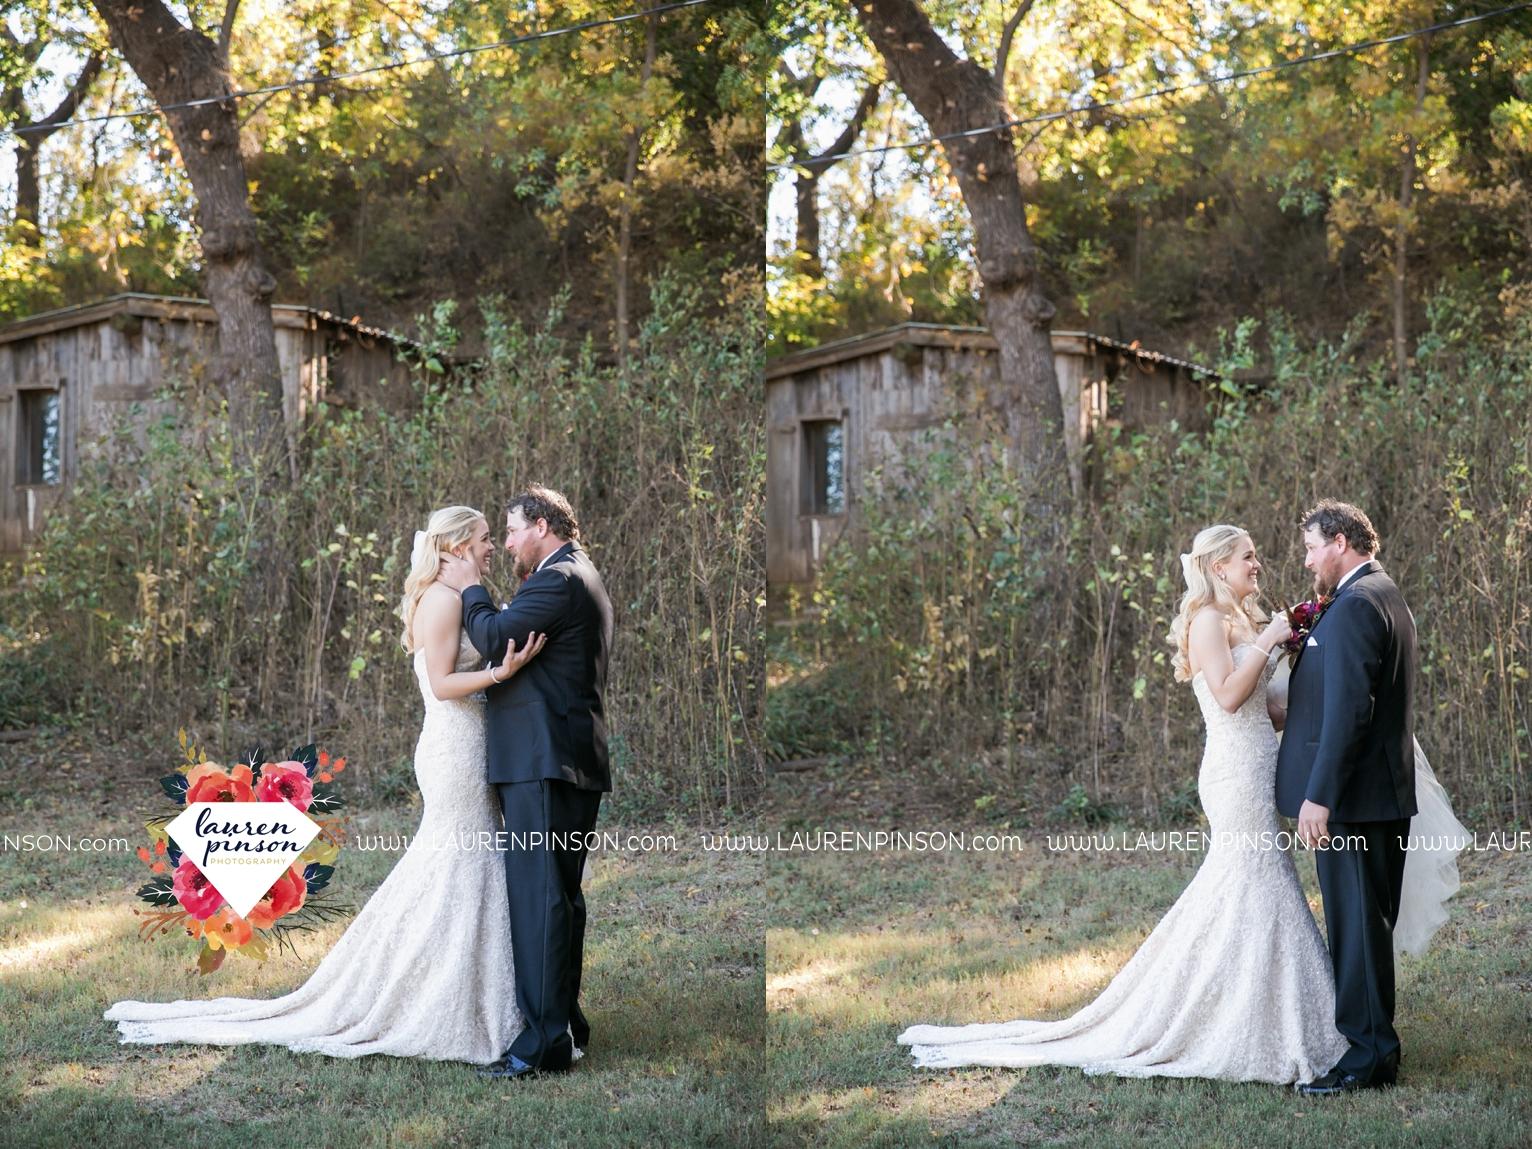 rustic-wichita-falls-texas-wedding-photographer-gold-glam-mayfield-events-market-street-united-allue-bridals-fall_1671.jpg